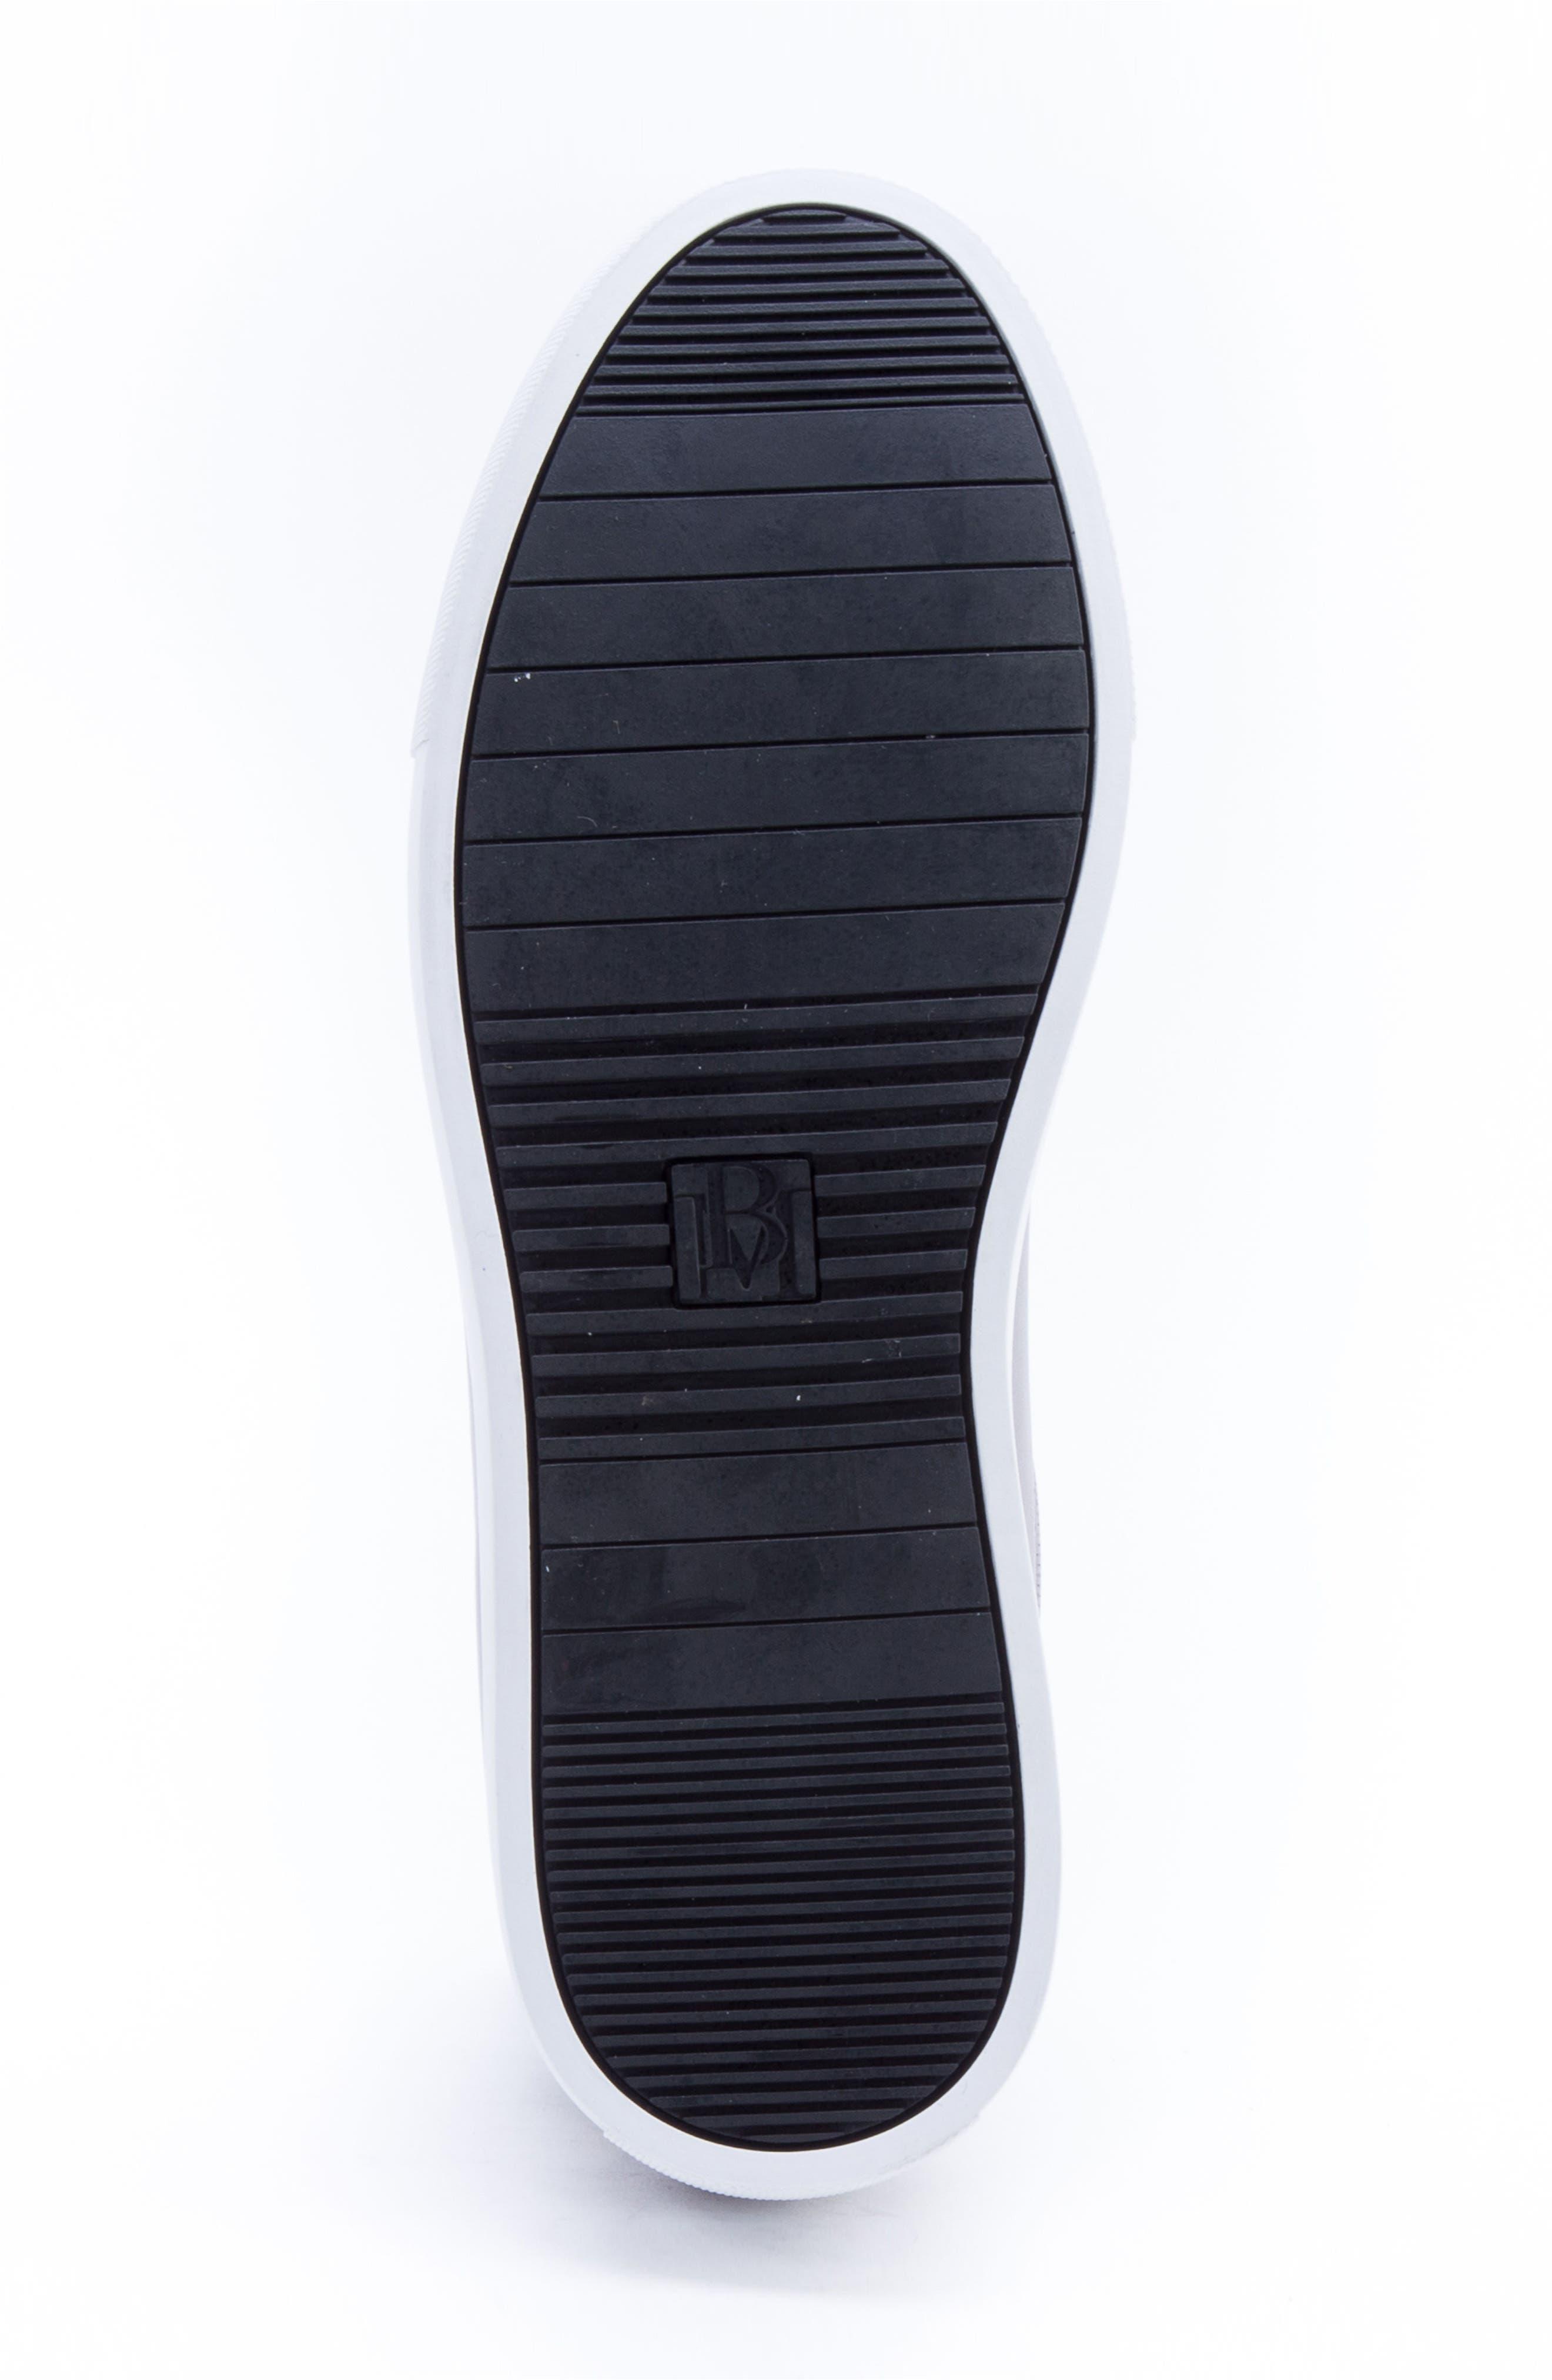 BADGLEY MISCHKA COLLECTION, Badgley Mischka Sanders Sneaker, Alternate thumbnail 5, color, GUN METAL LEATHER